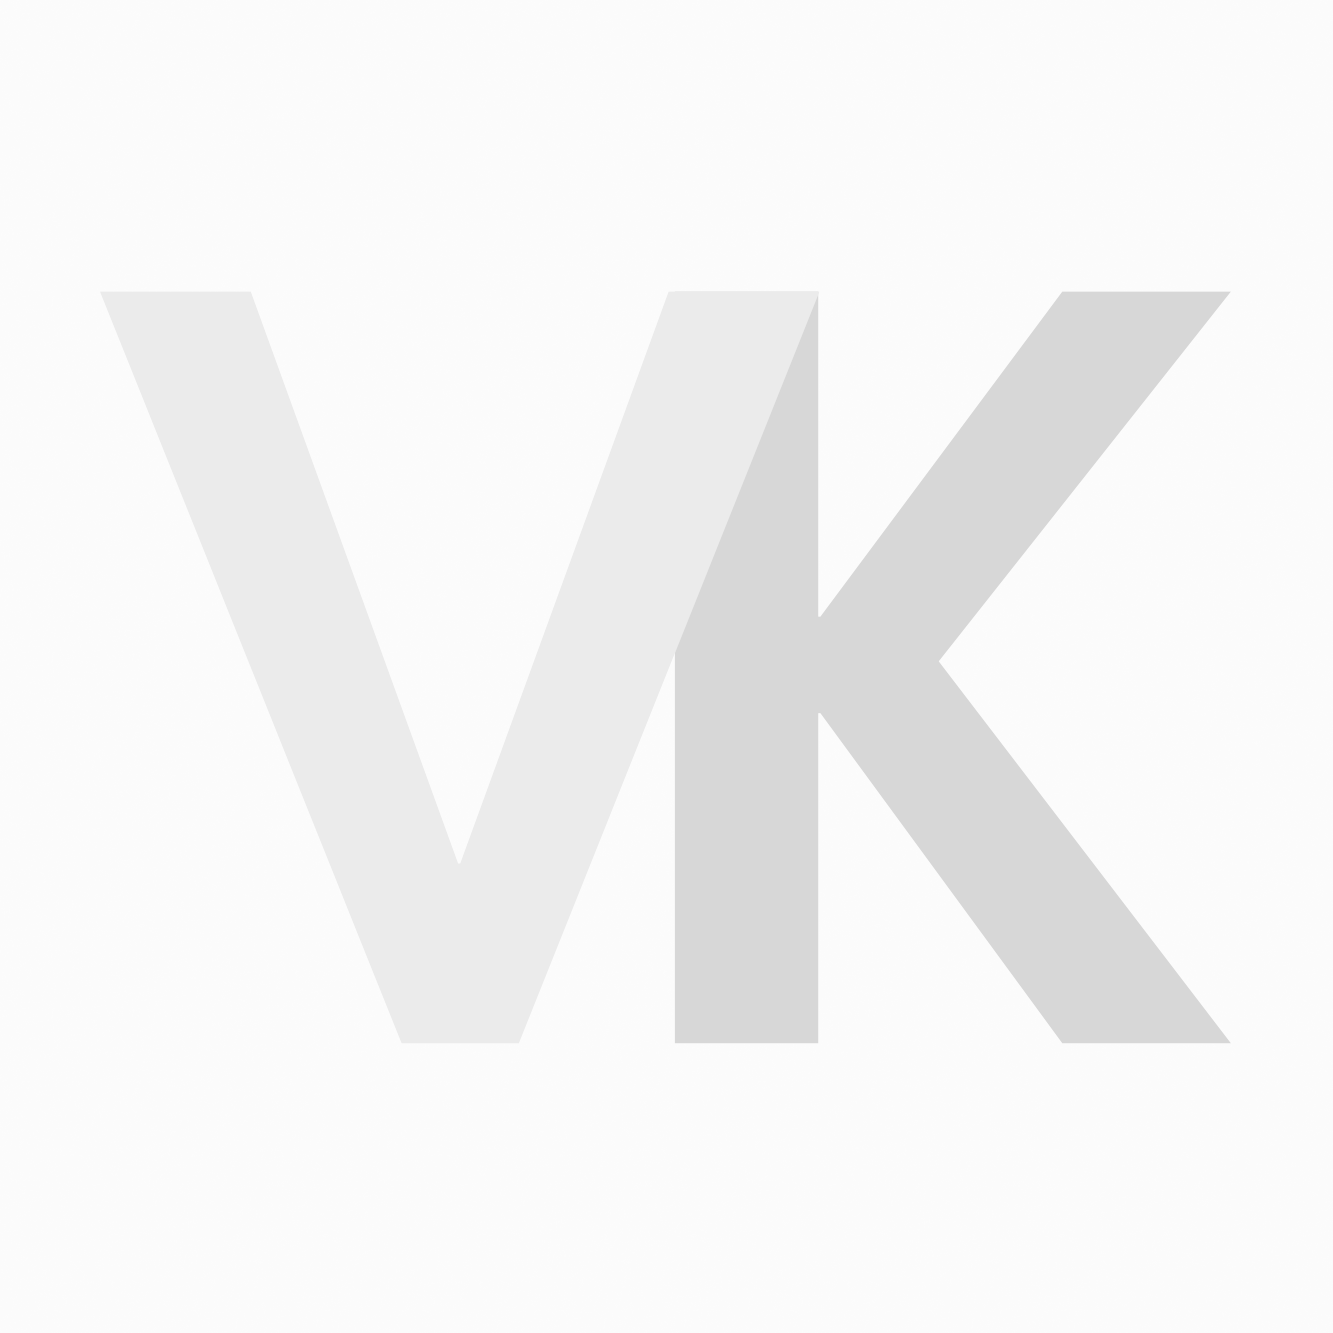 Wahl Finale Shaver Scheerfolie + Lamellenmes